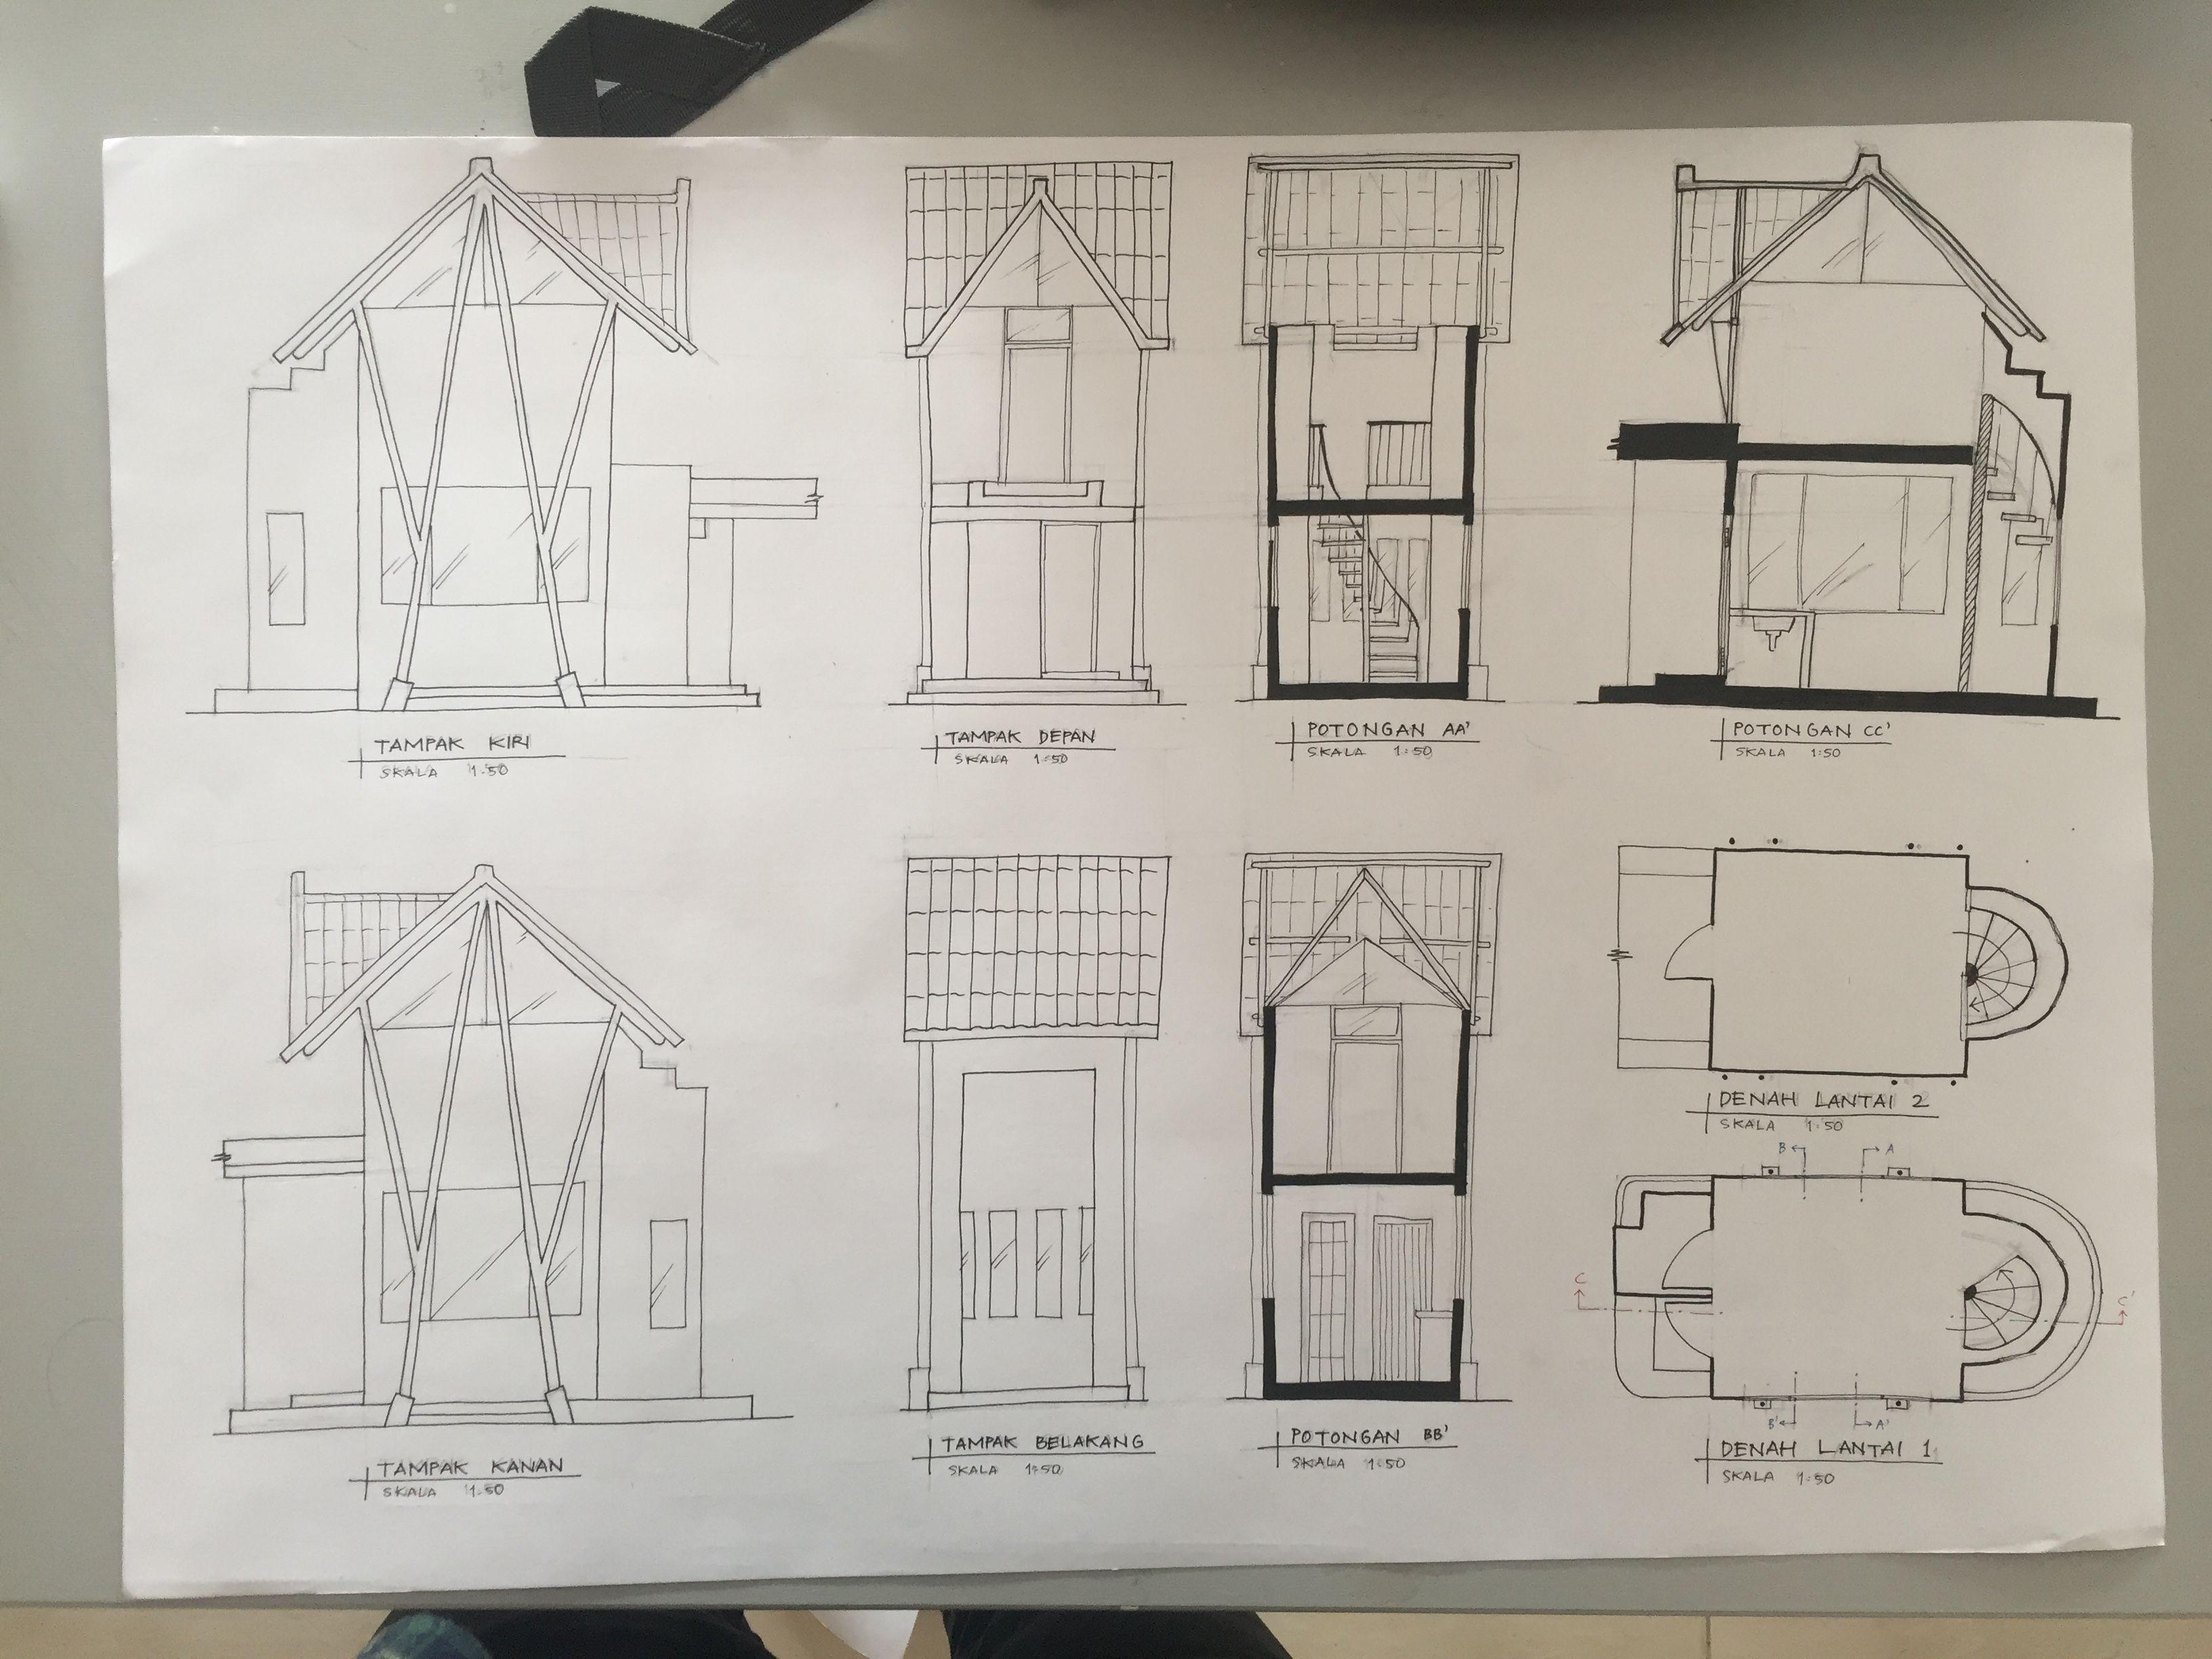 Ortografis Pos Satpam Section Elevation Plan Presentasi Arsitektur Arsitektur Presentasi